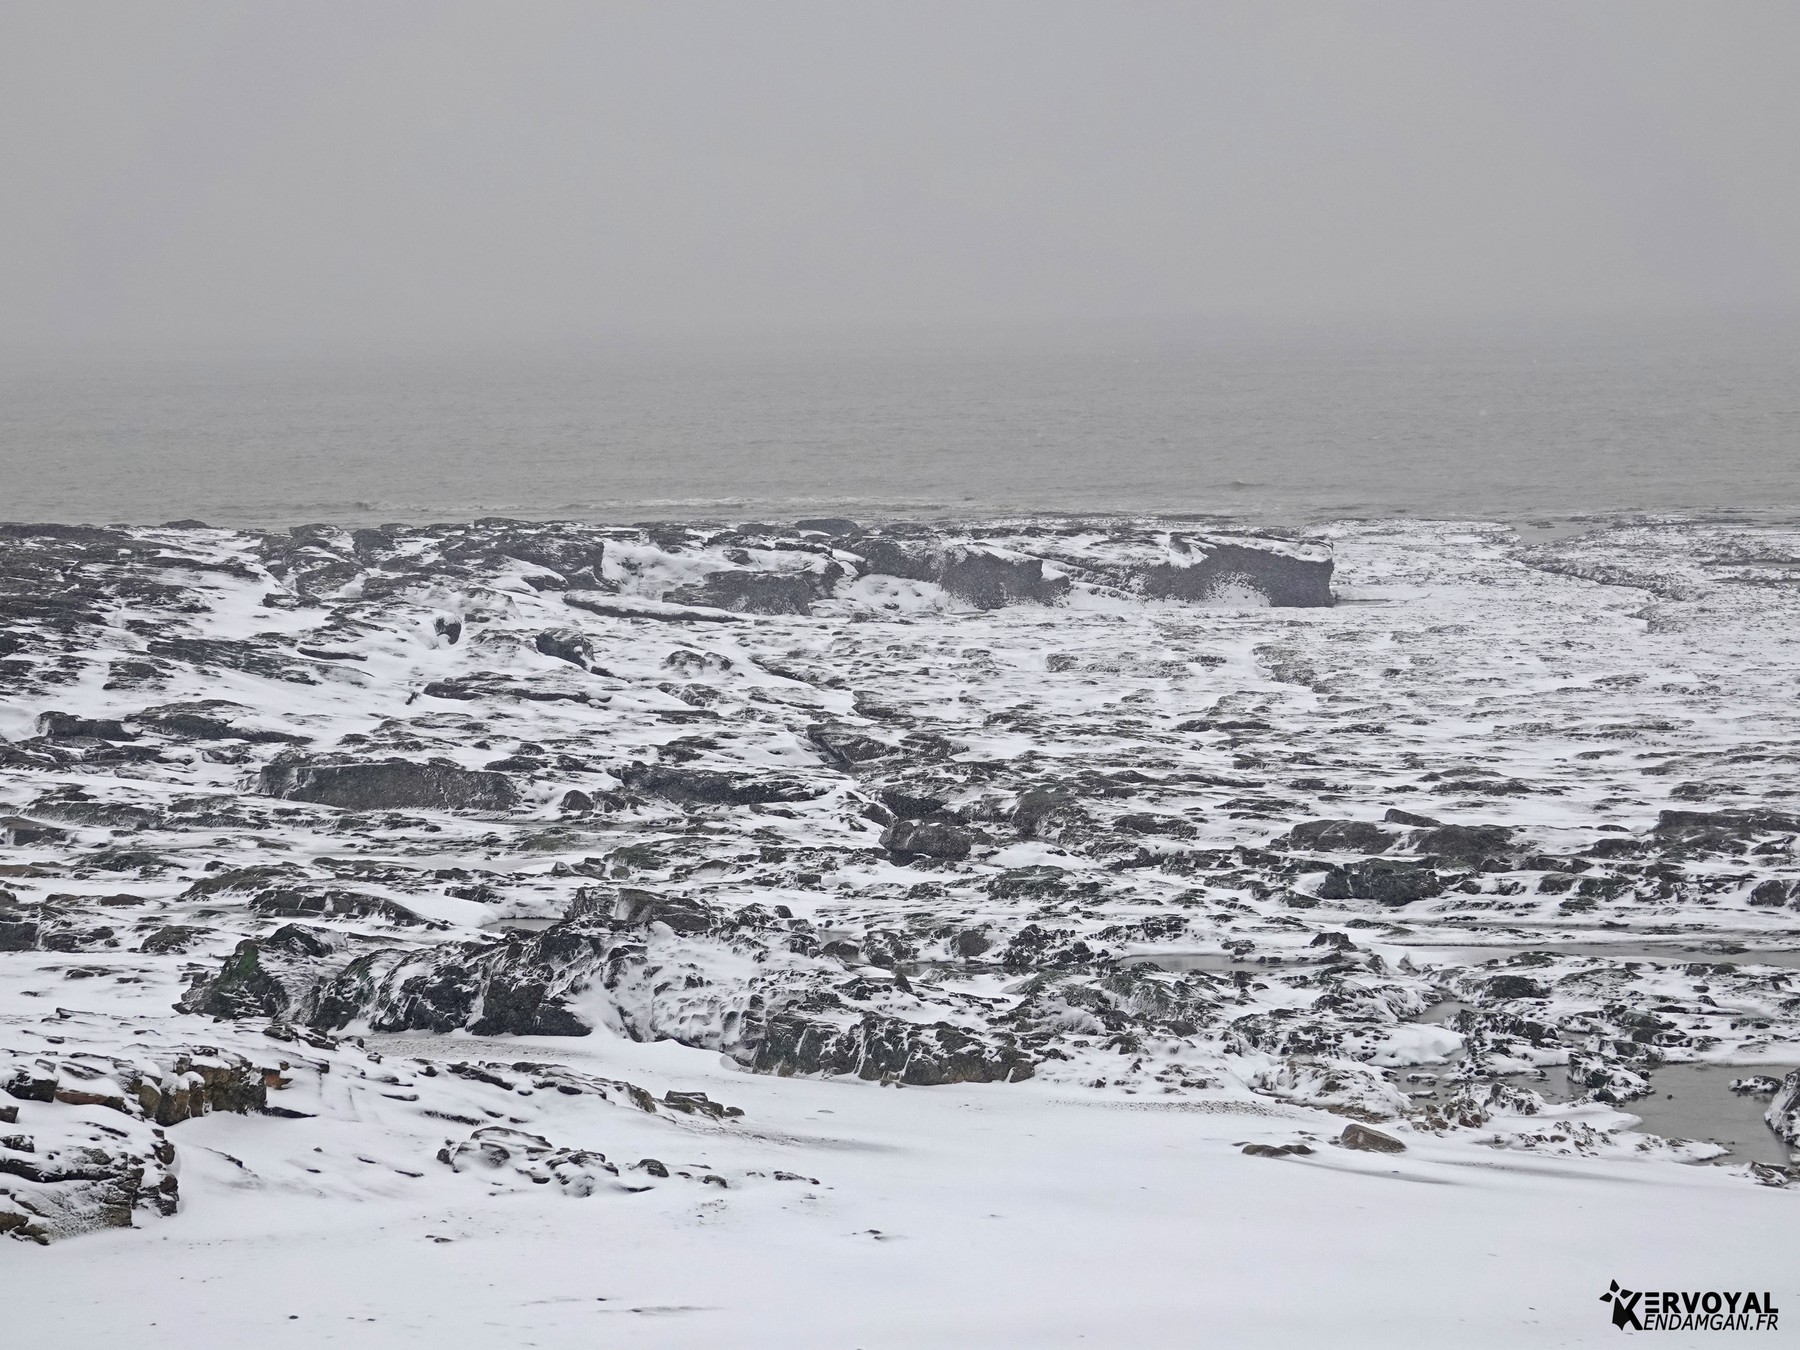 neige à kervoyal 11 février 2021 damgan morbihan (42)